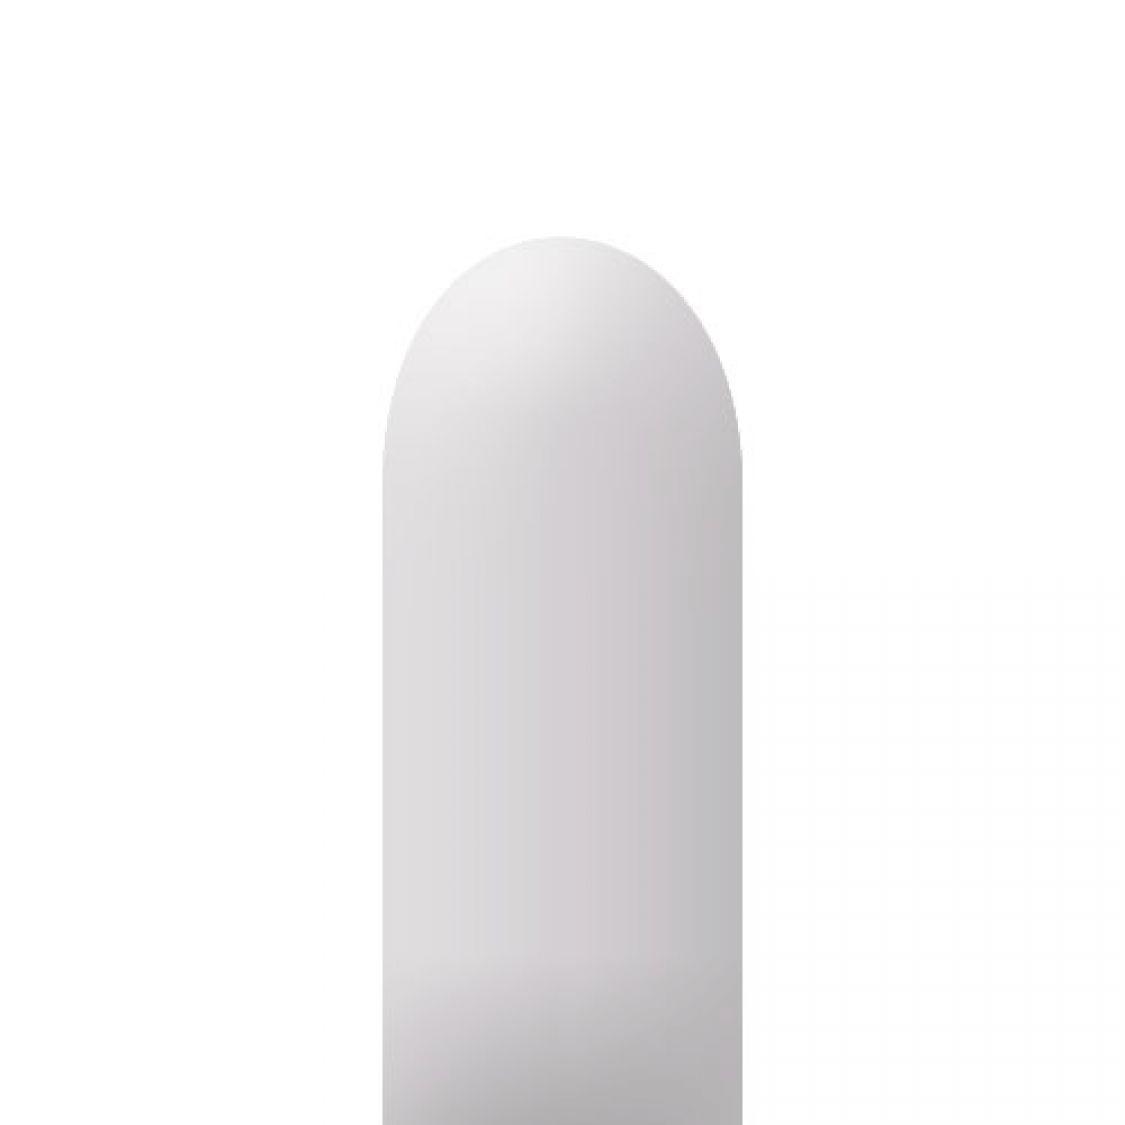 ballons sculpter gris grey. Black Bedroom Furniture Sets. Home Design Ideas